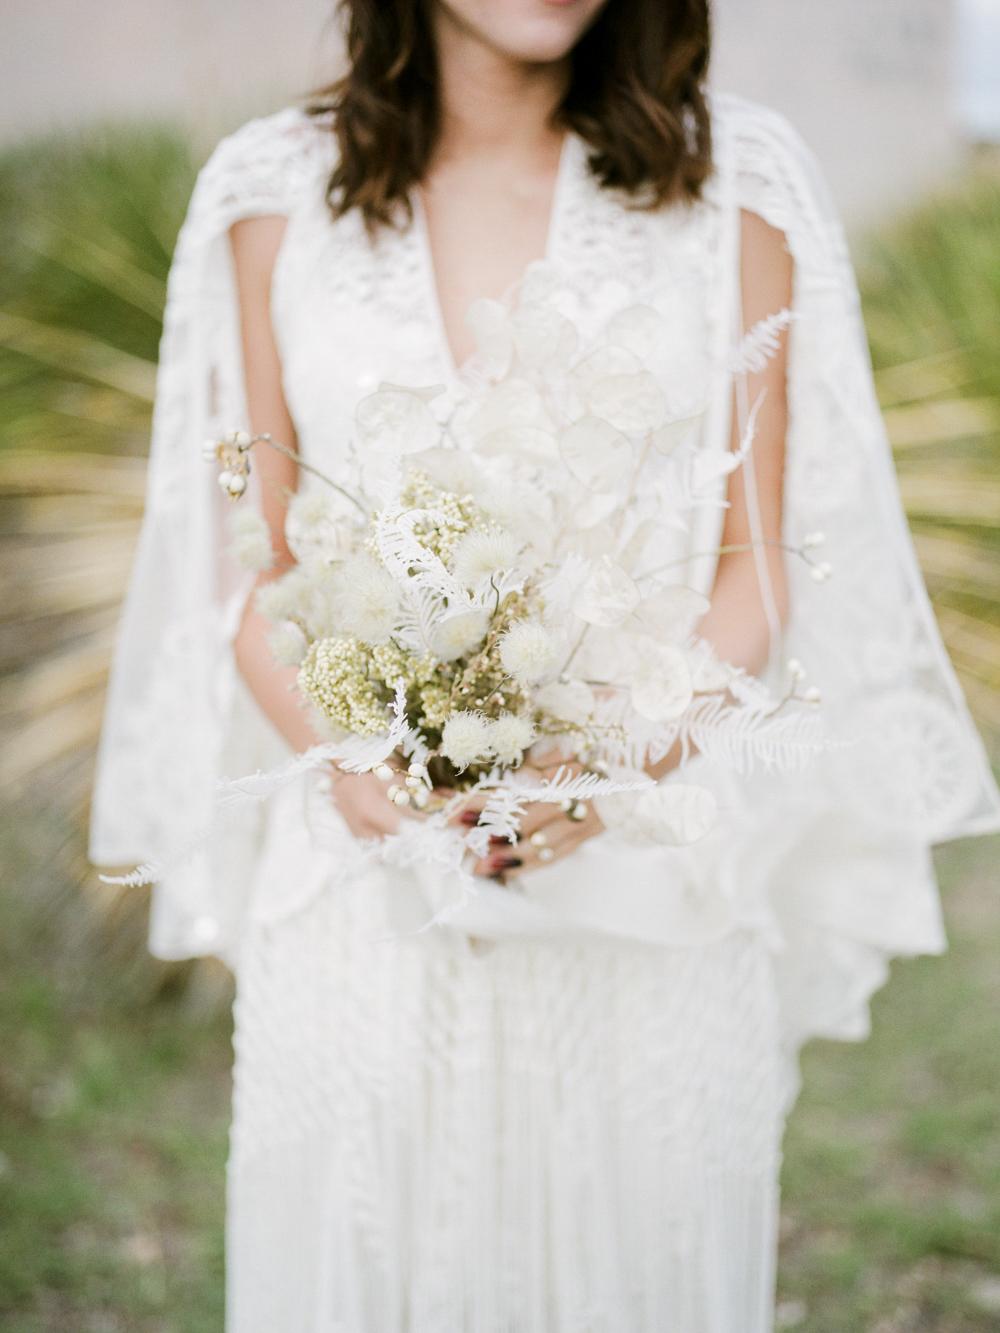 Christine Gosch - destination film photographer - houston wedding photographer - fine art film photographer - elopement photographer - destination wedding - understated wedding - simple beautiful wedding photography-90.jpg